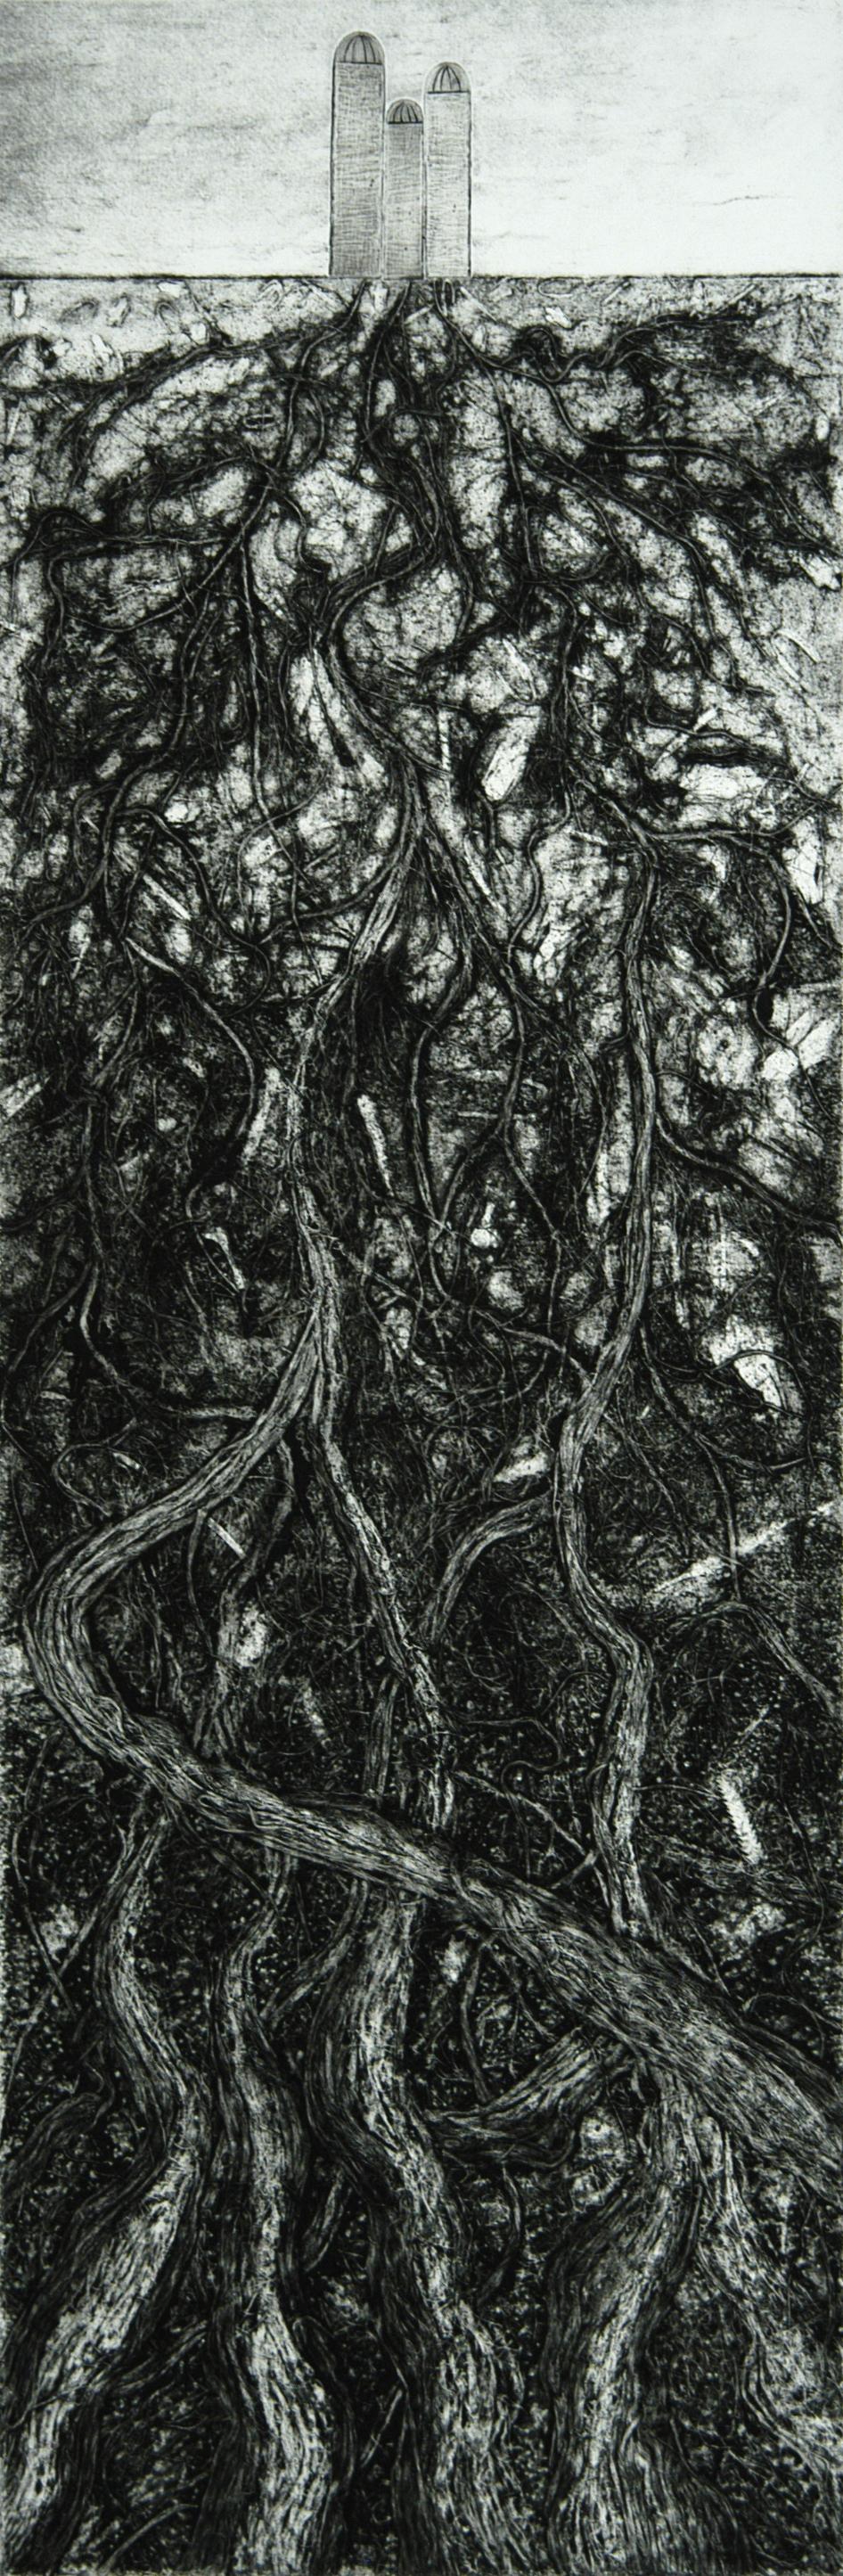 Sustenance Roots III